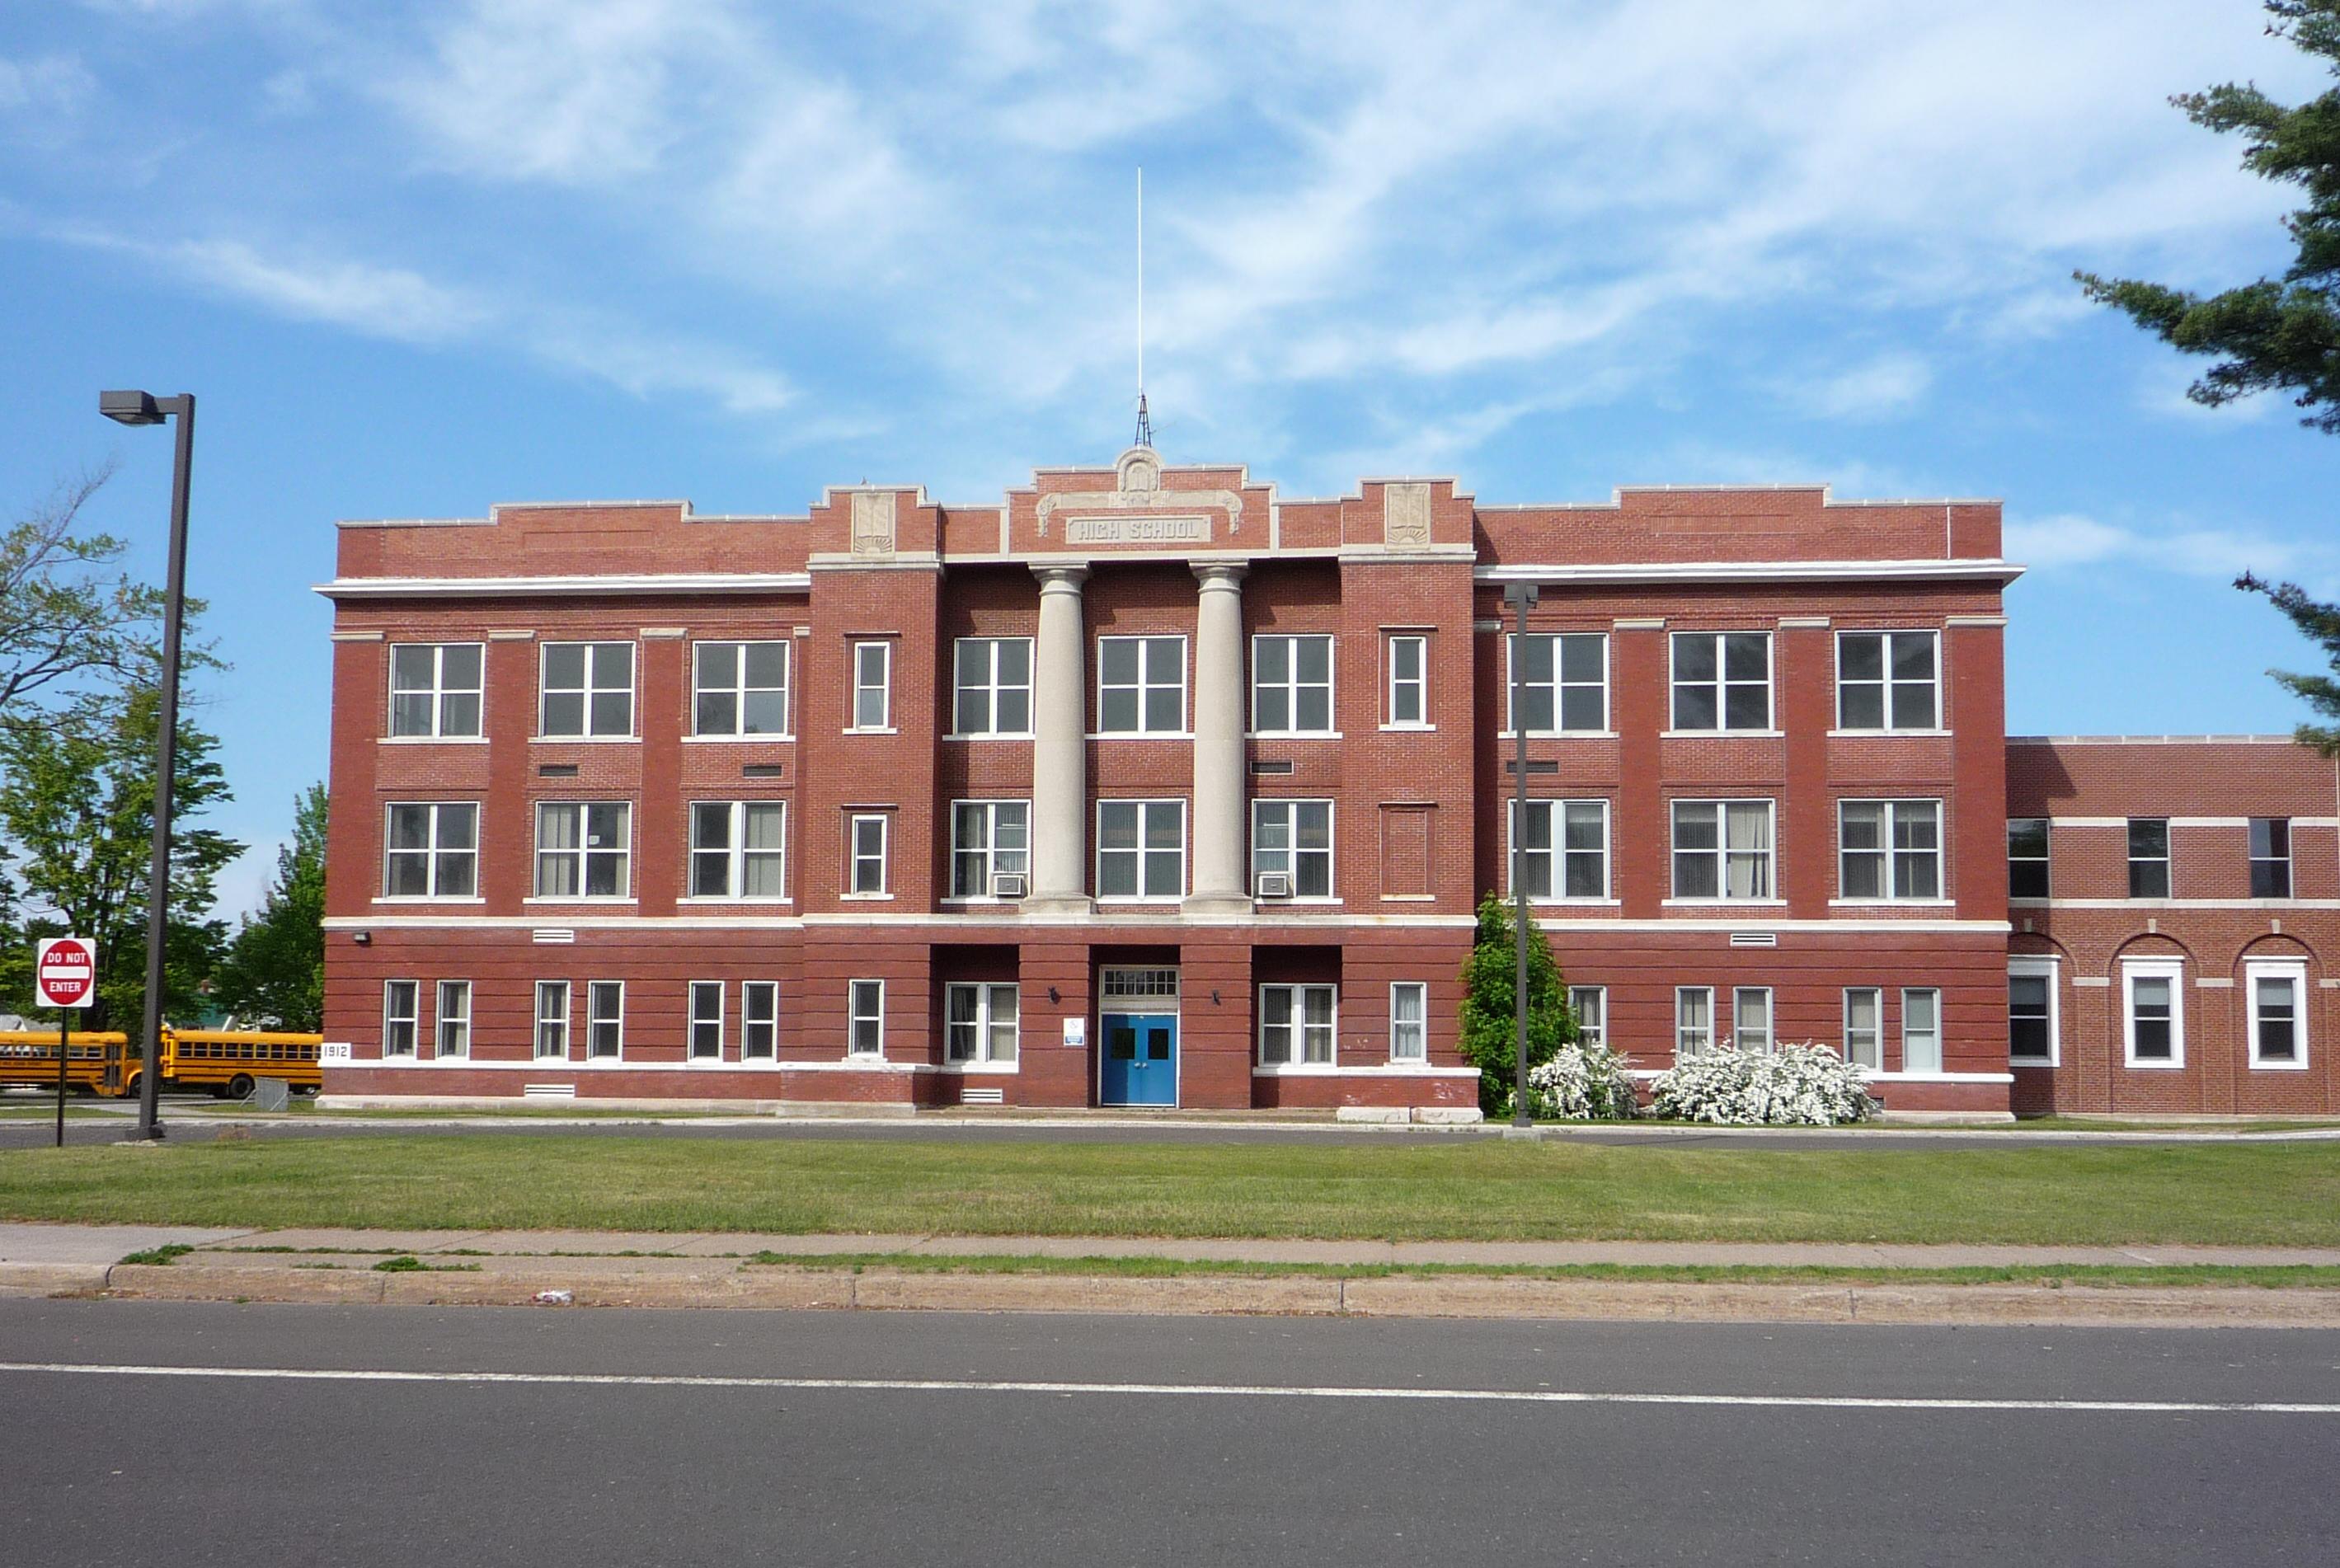 https://i2.wp.com/upload.wikimedia.org/wikipedia/commons/8/82/2009-0617-Ontonagon-school.jpg